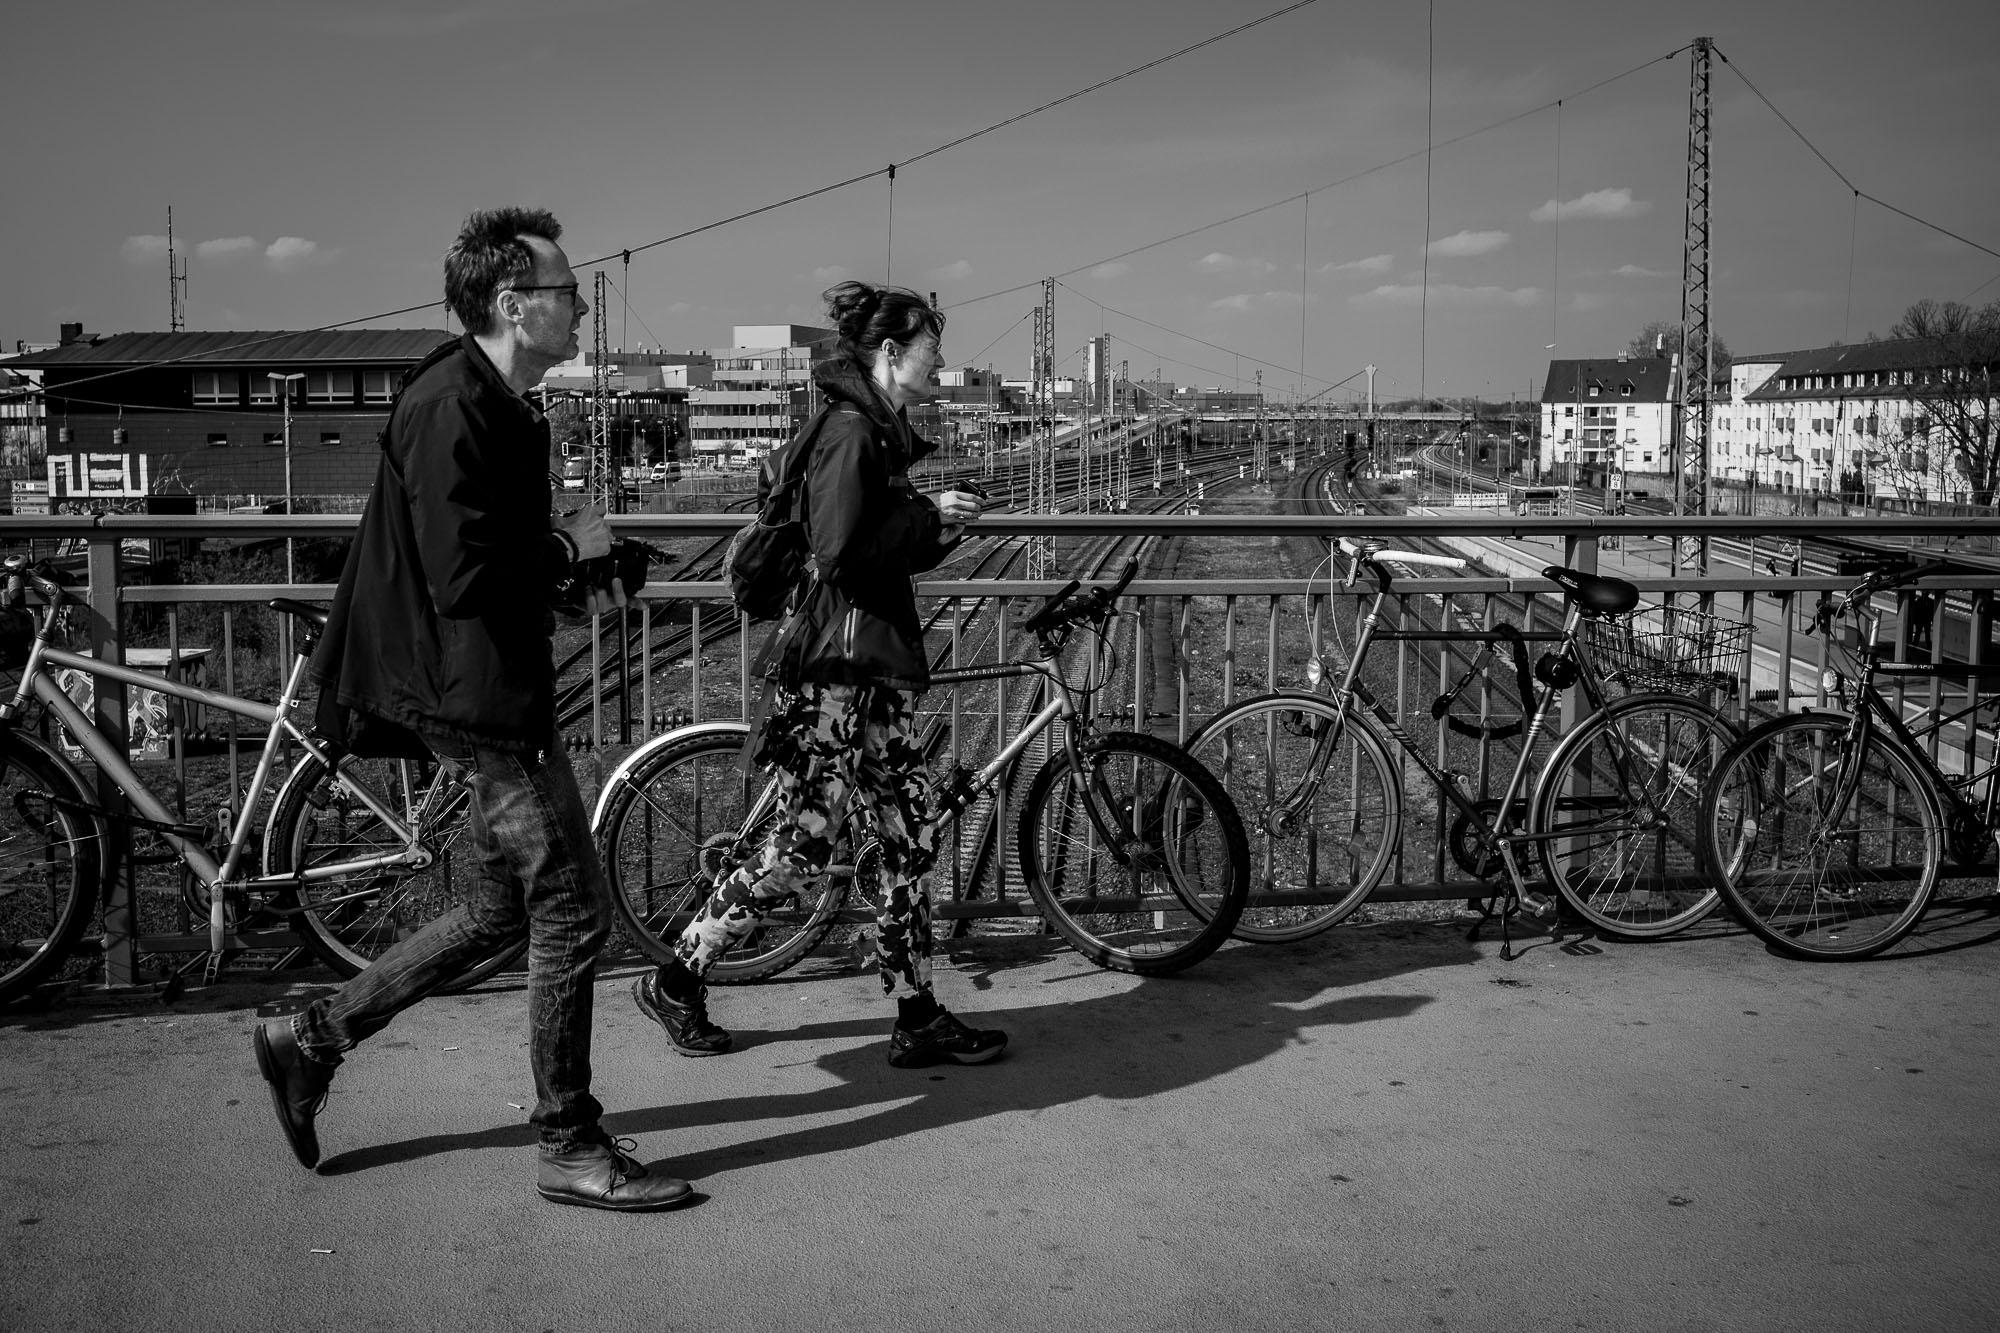 Photographers walking across a bridge above train tracks